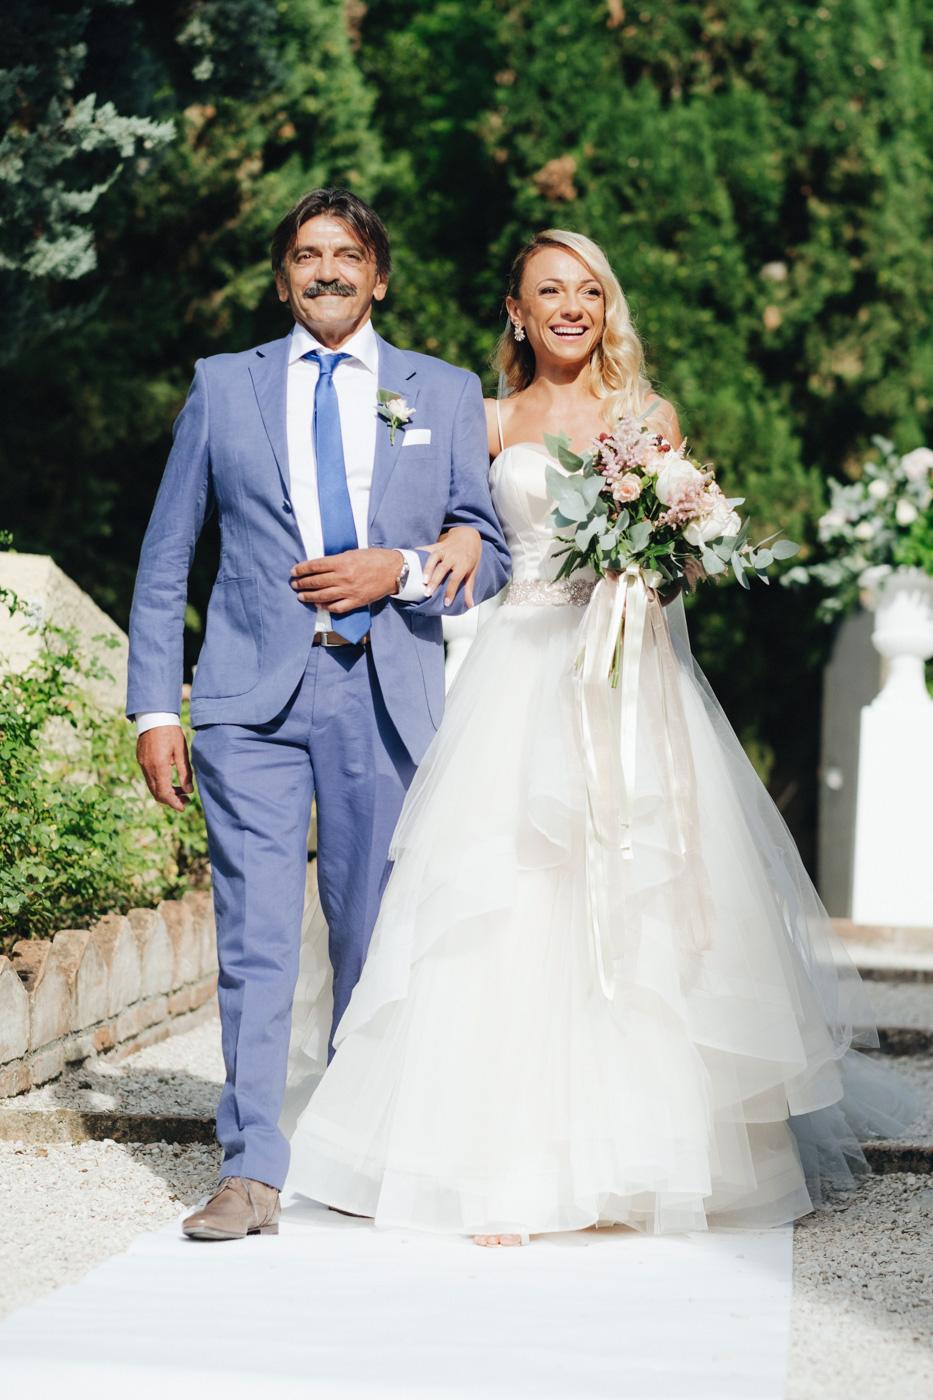 Matrimoni all'italiana wedding photographer italy-63.jpg